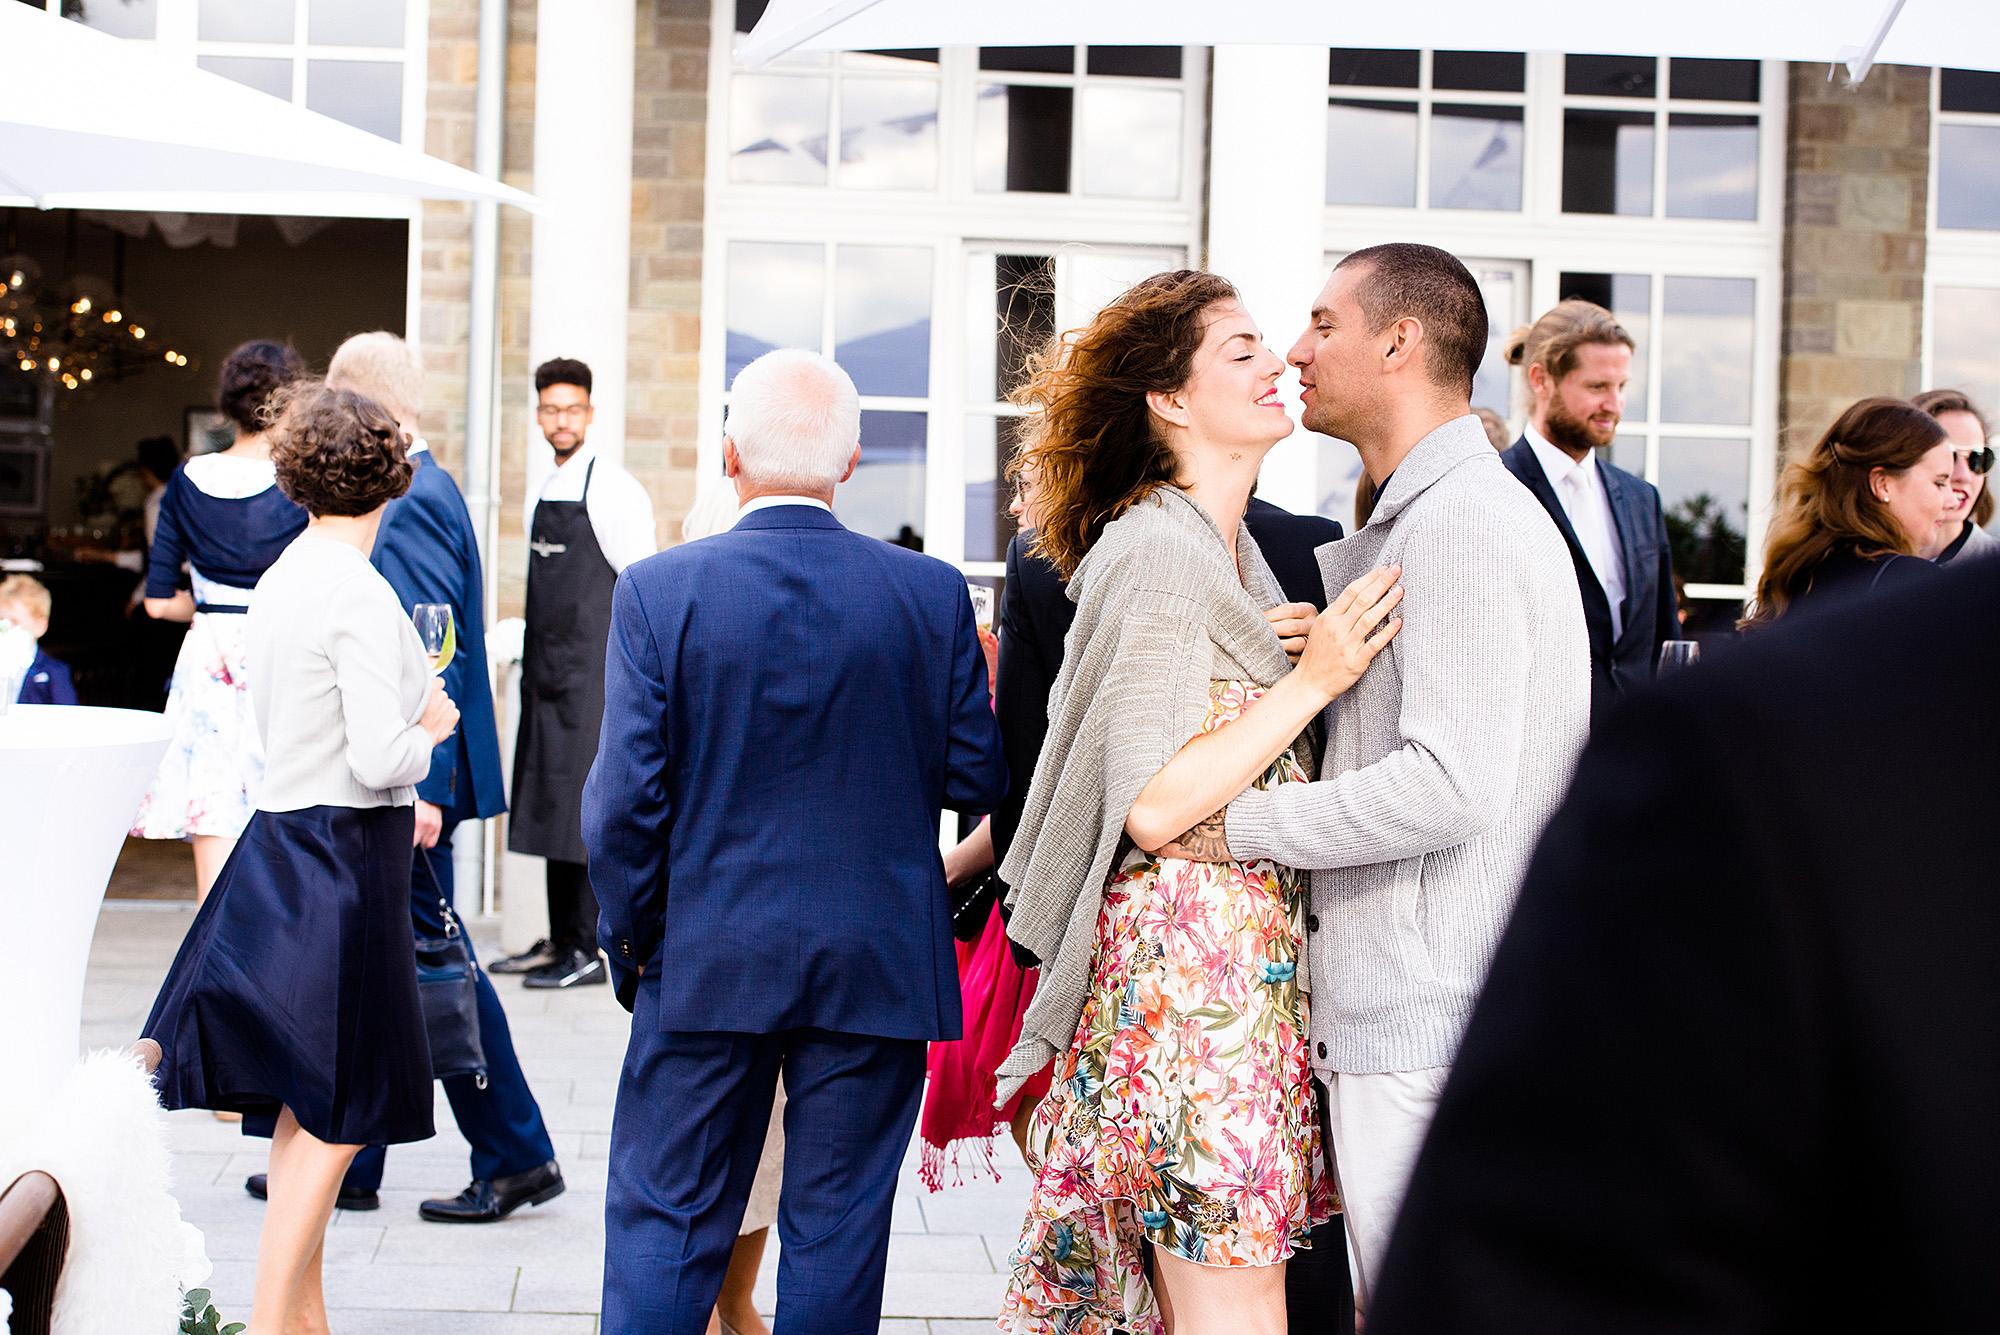 Eventfotografie_Berlin_Cathrin_Bauer_15